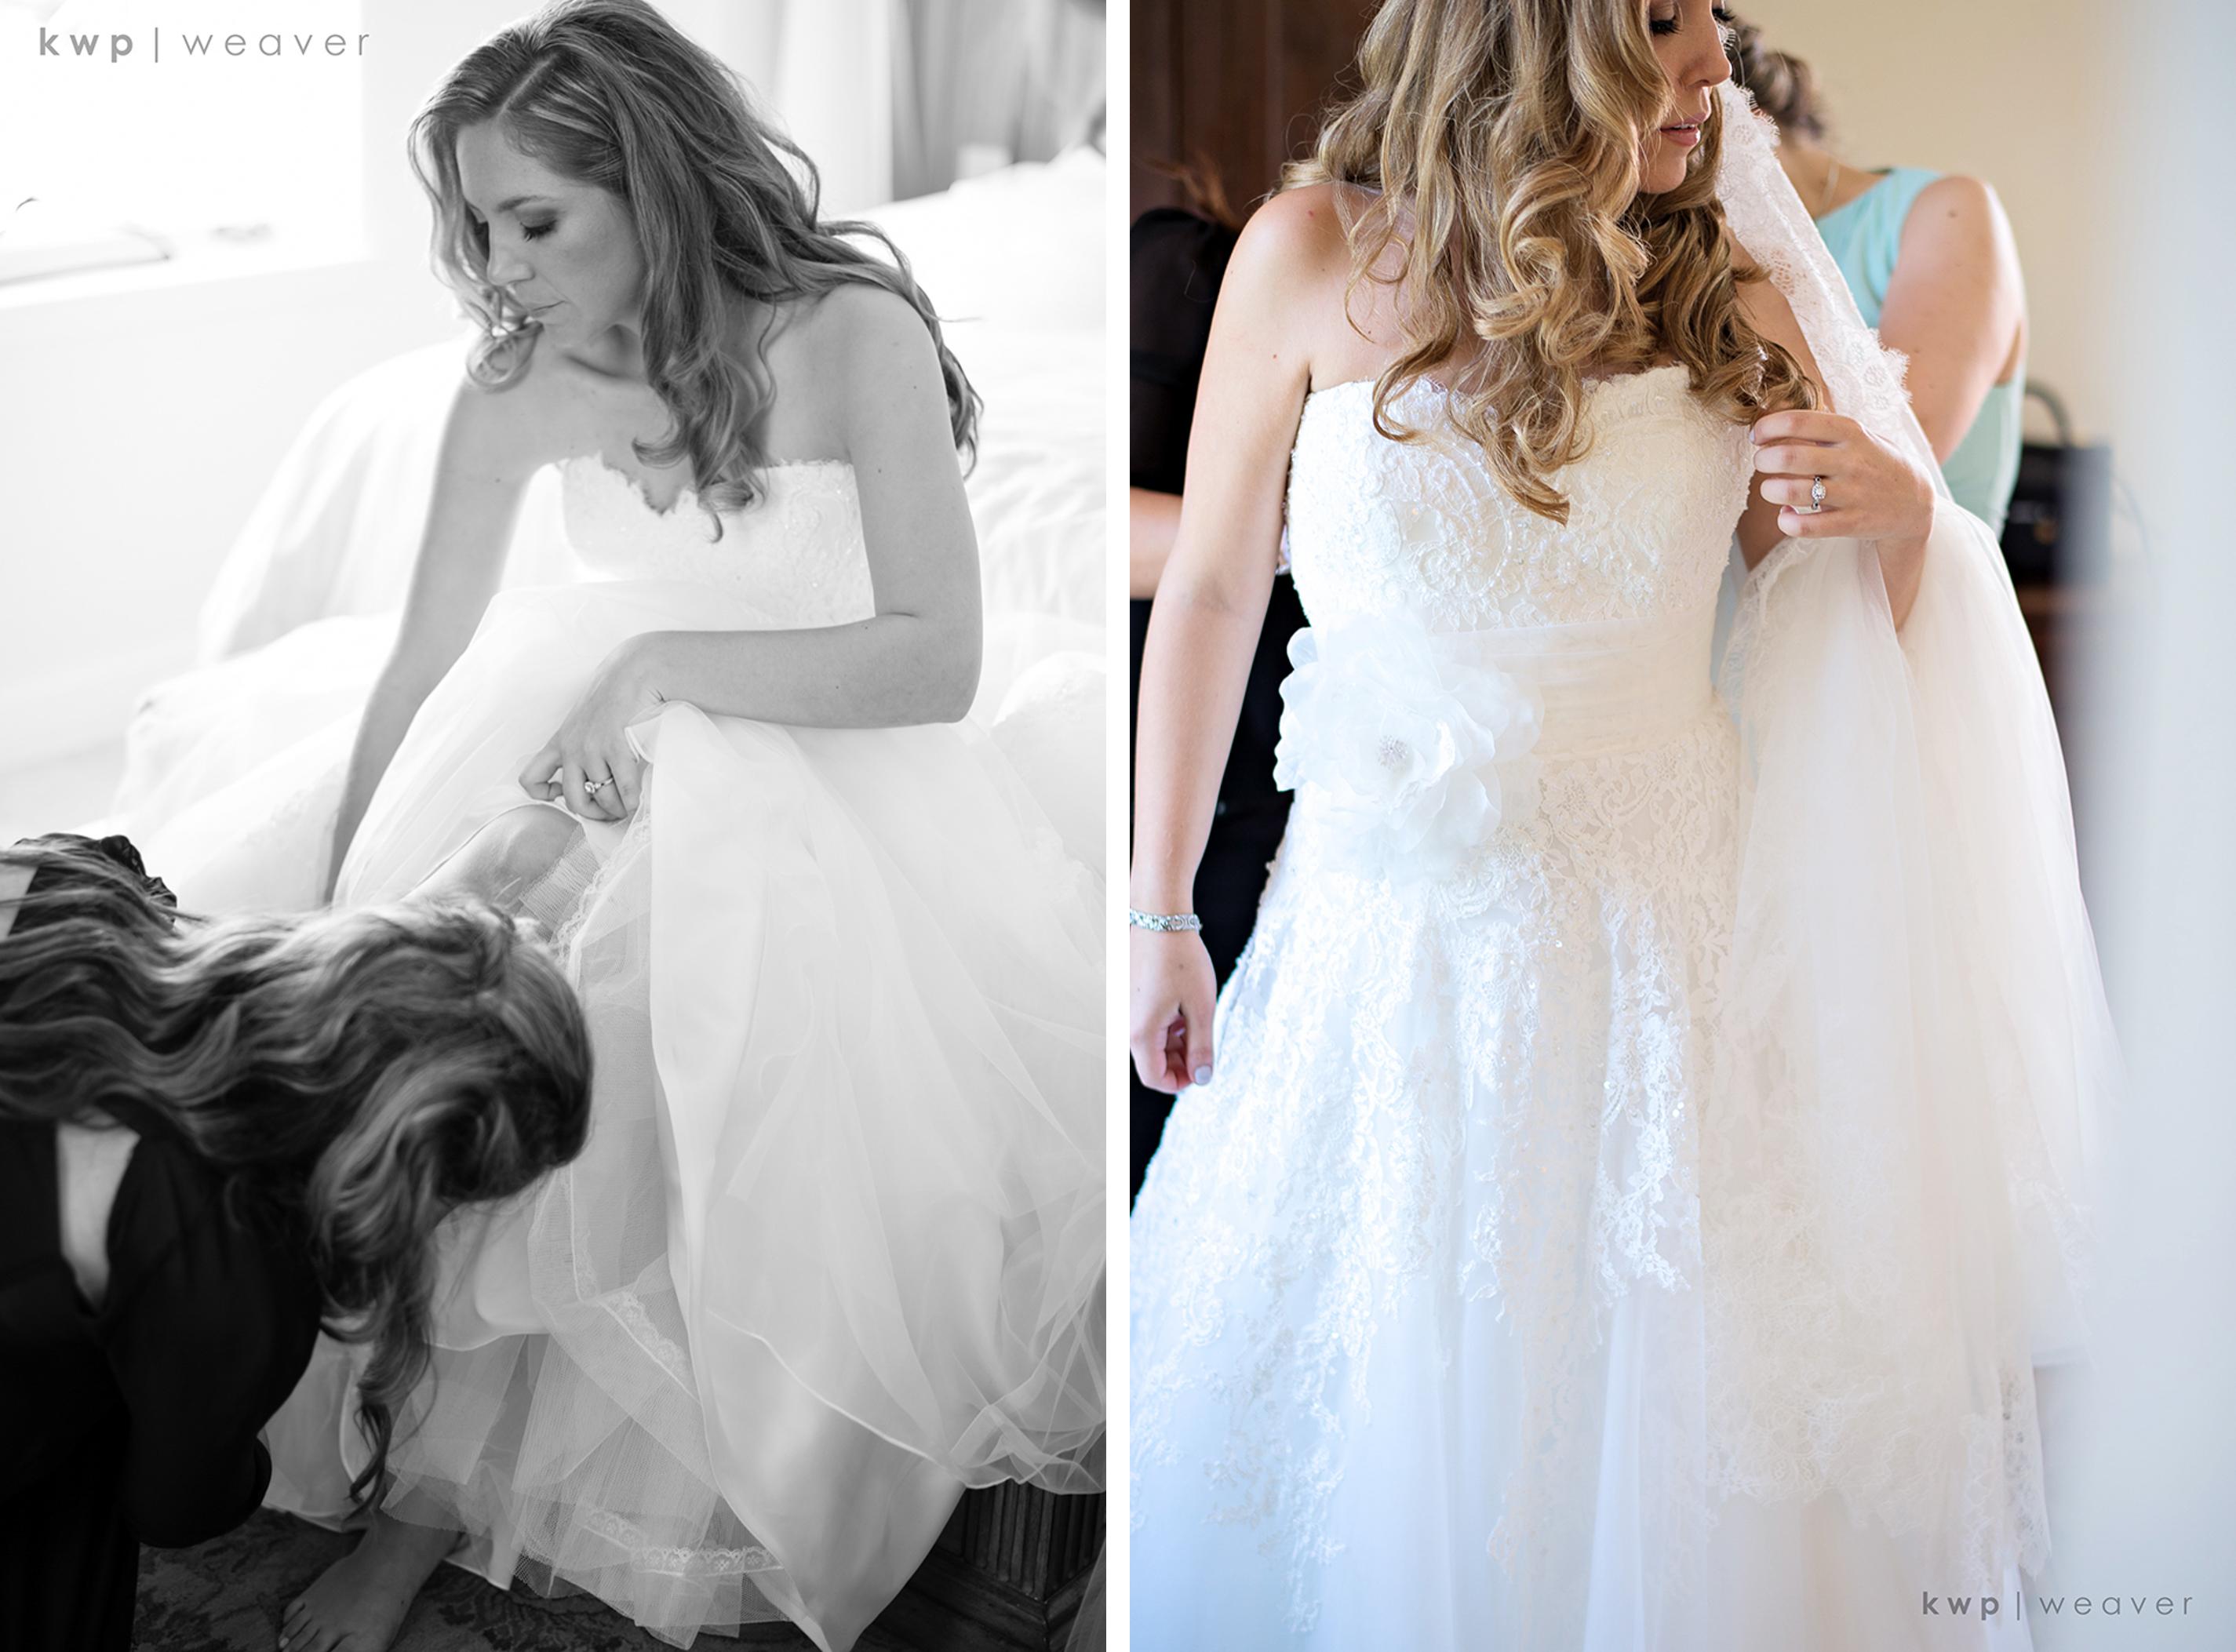 biltmore-wedding-13